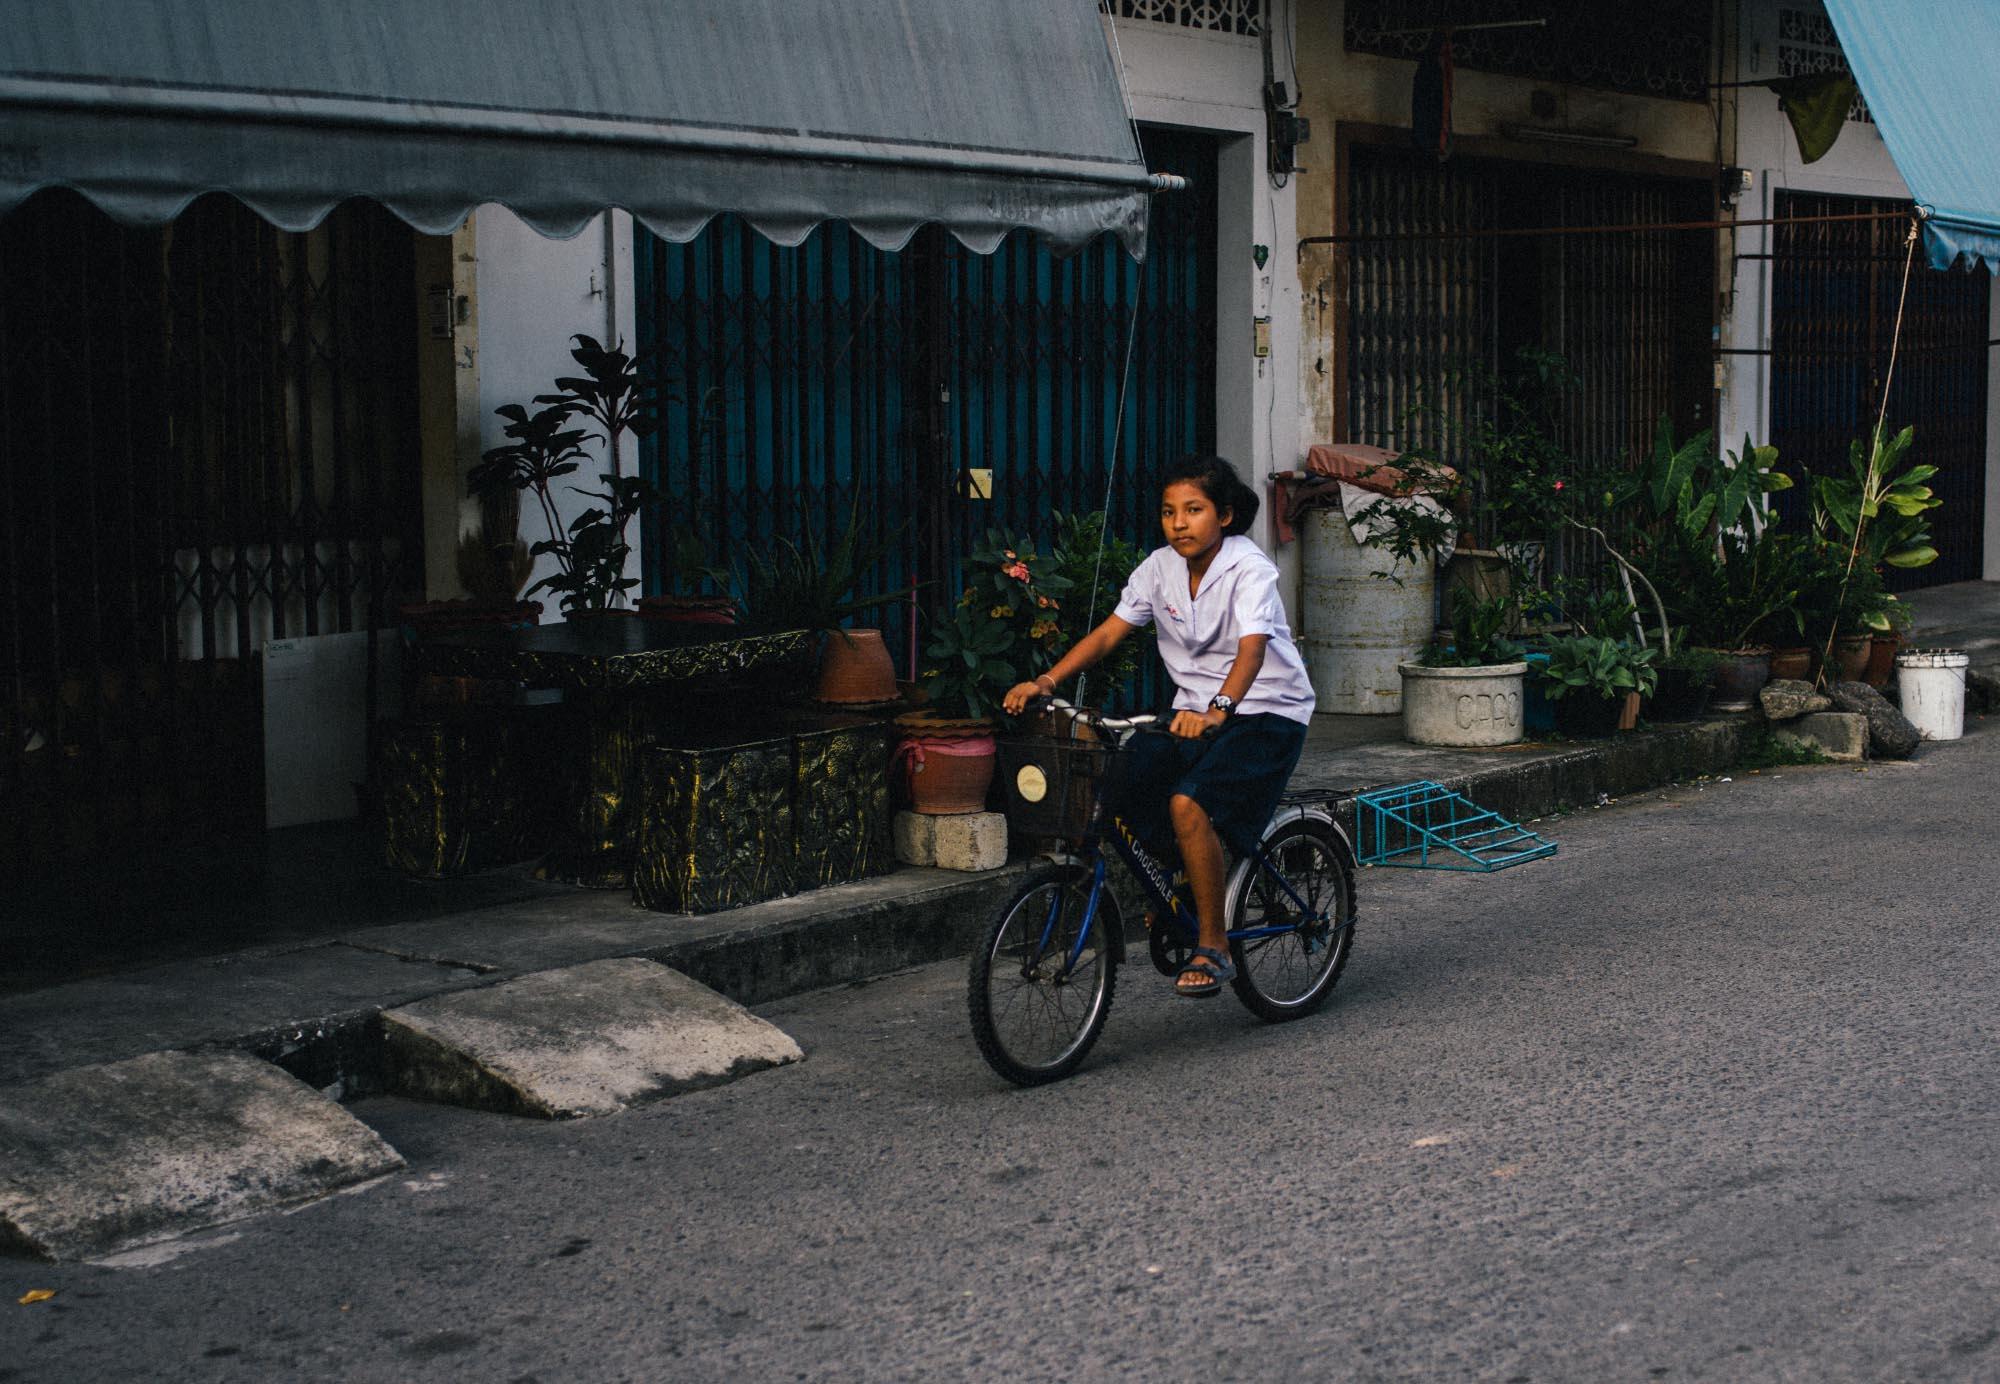 Girl riding bike.